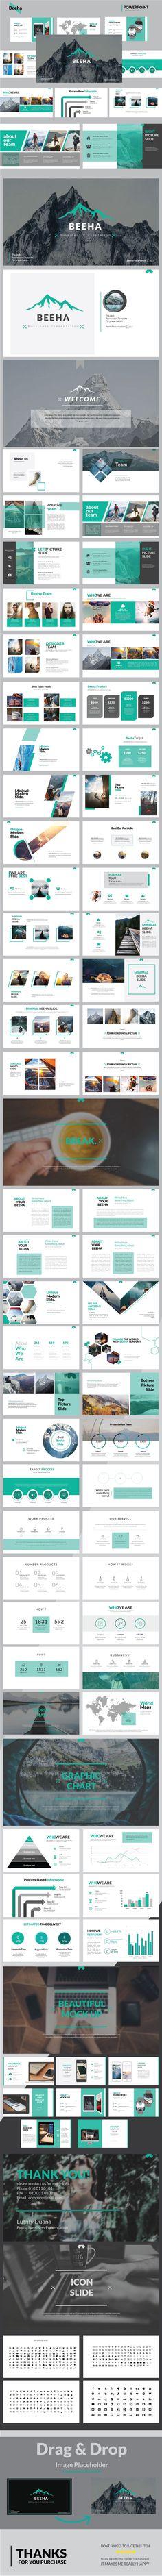 Beeha - Multipurpose PowerPoint Presentation Templates